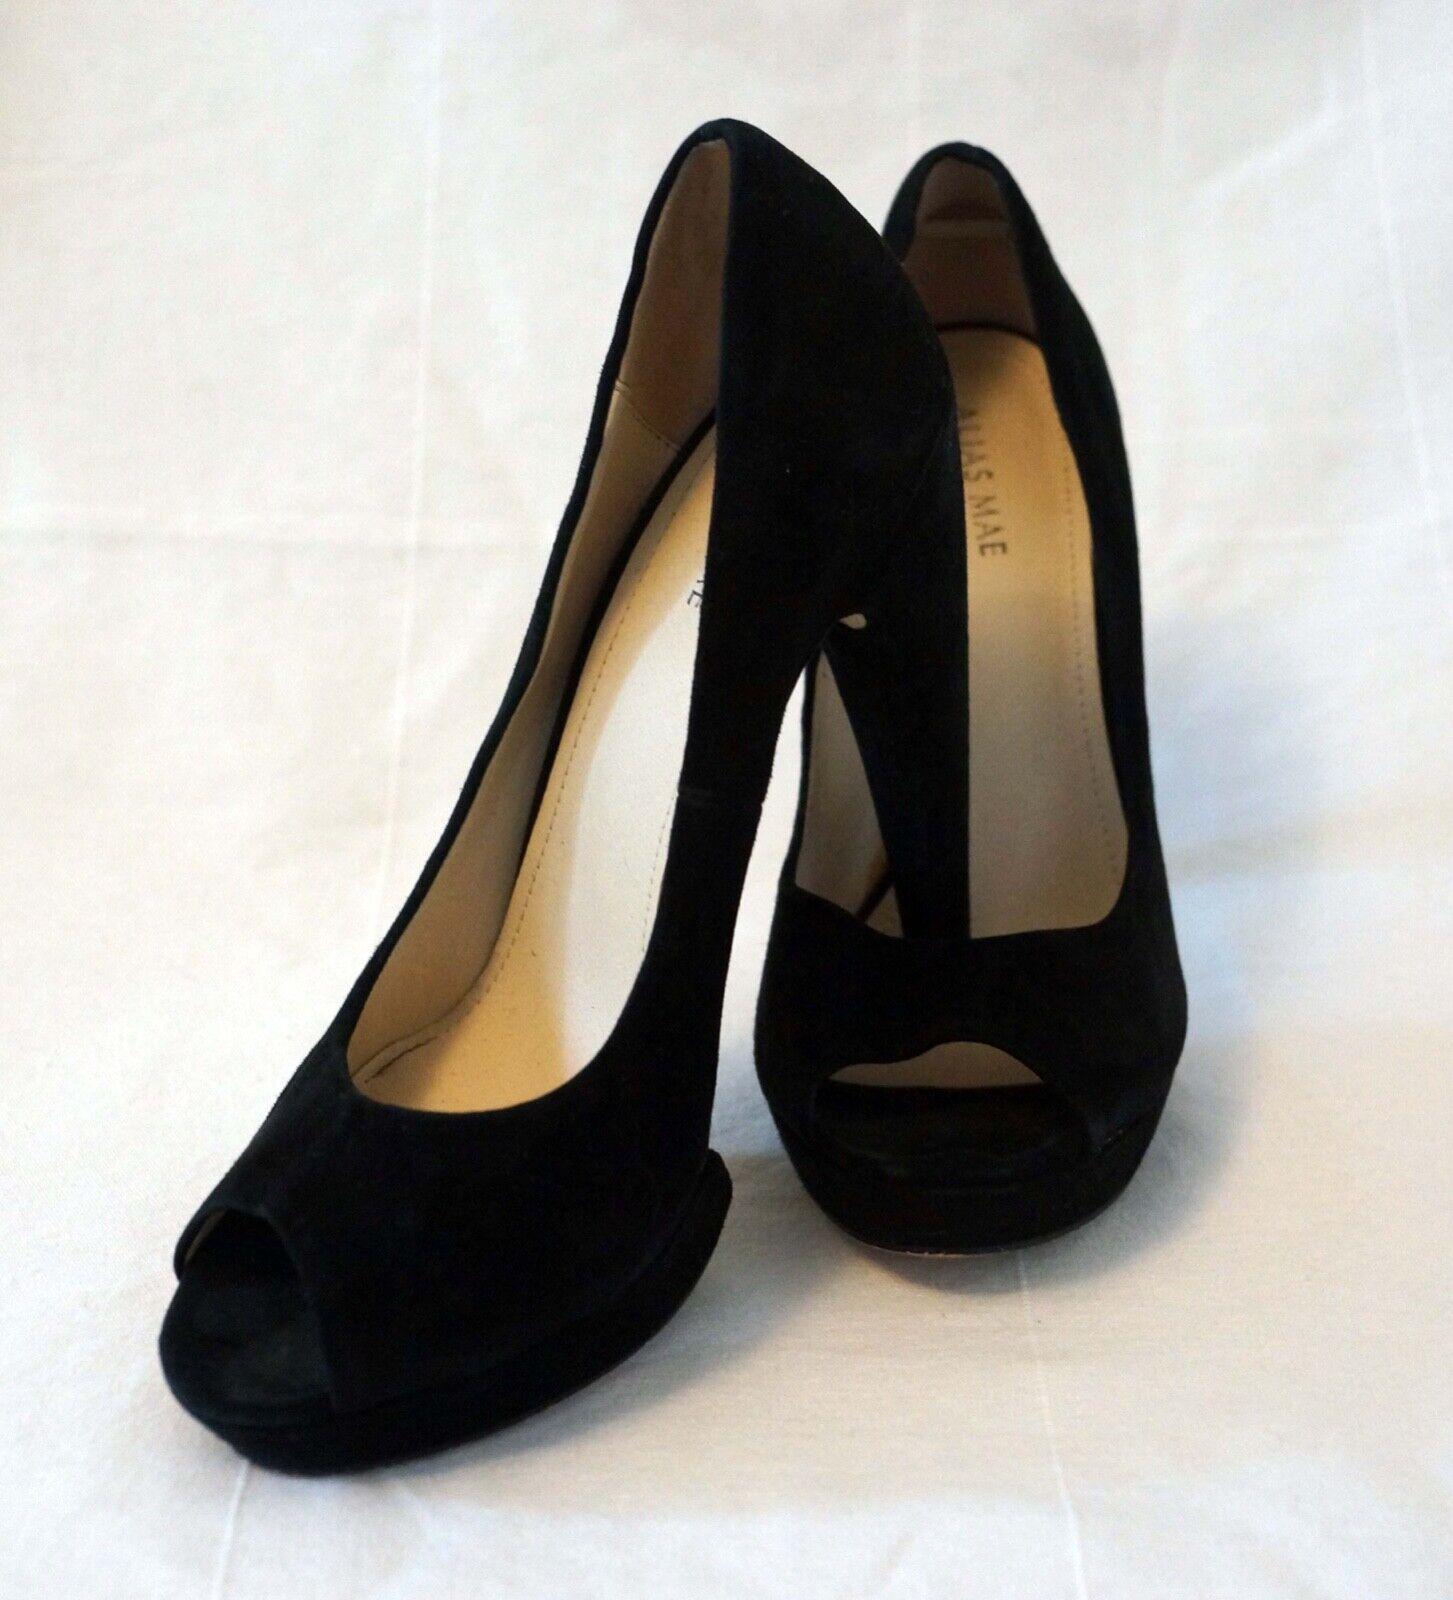 ALIAS MAE -Sued high heel peep toe with platformSize 8- 12cm heel